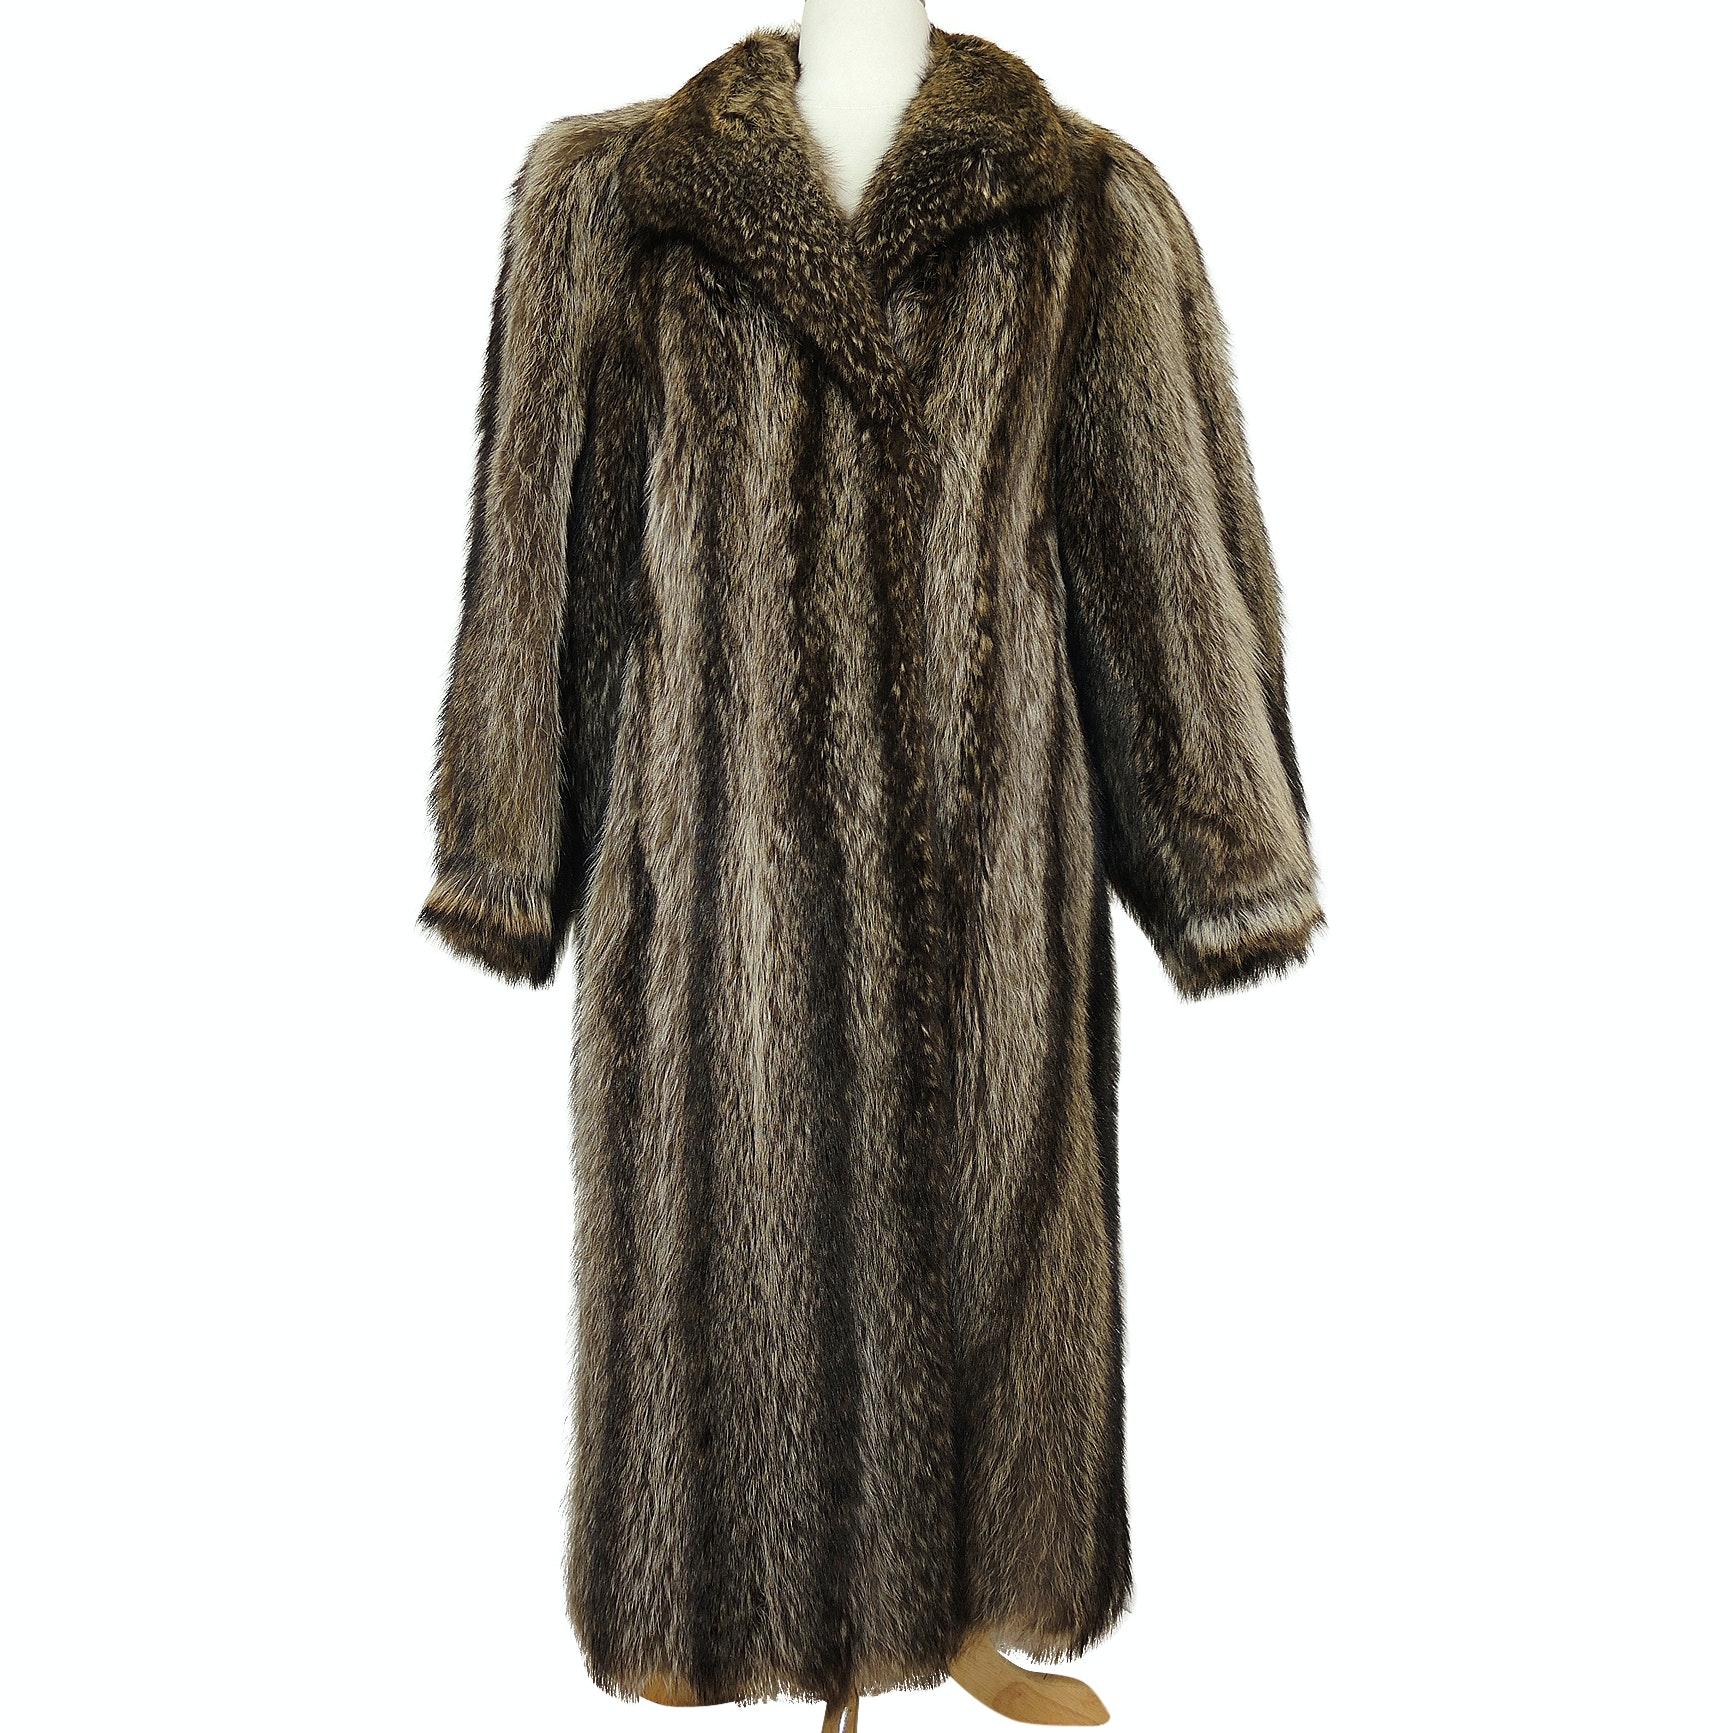 Vintage Parisian Raccoon Fur Coat